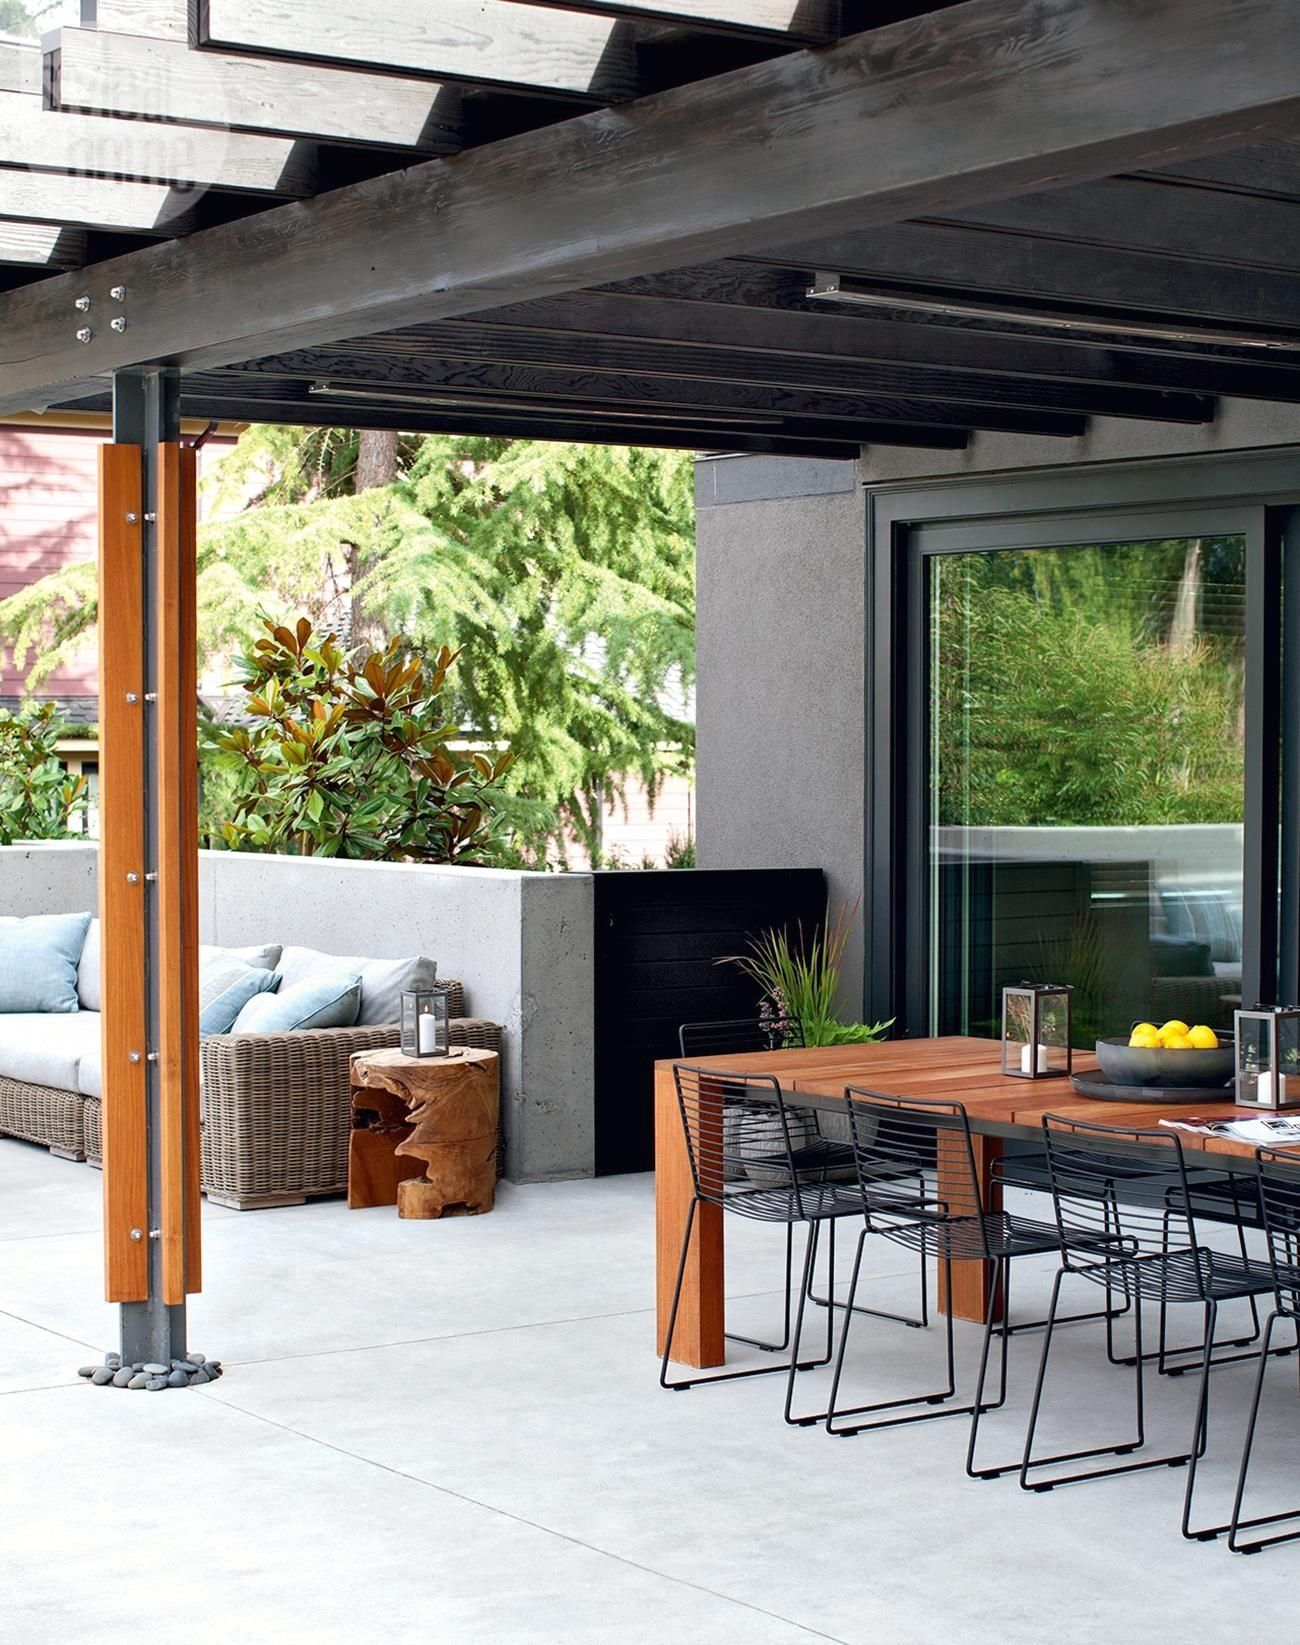 Outdoor design: Multi-functional backyard retreat | Style ... on Functional Backyard Ideas id=22031